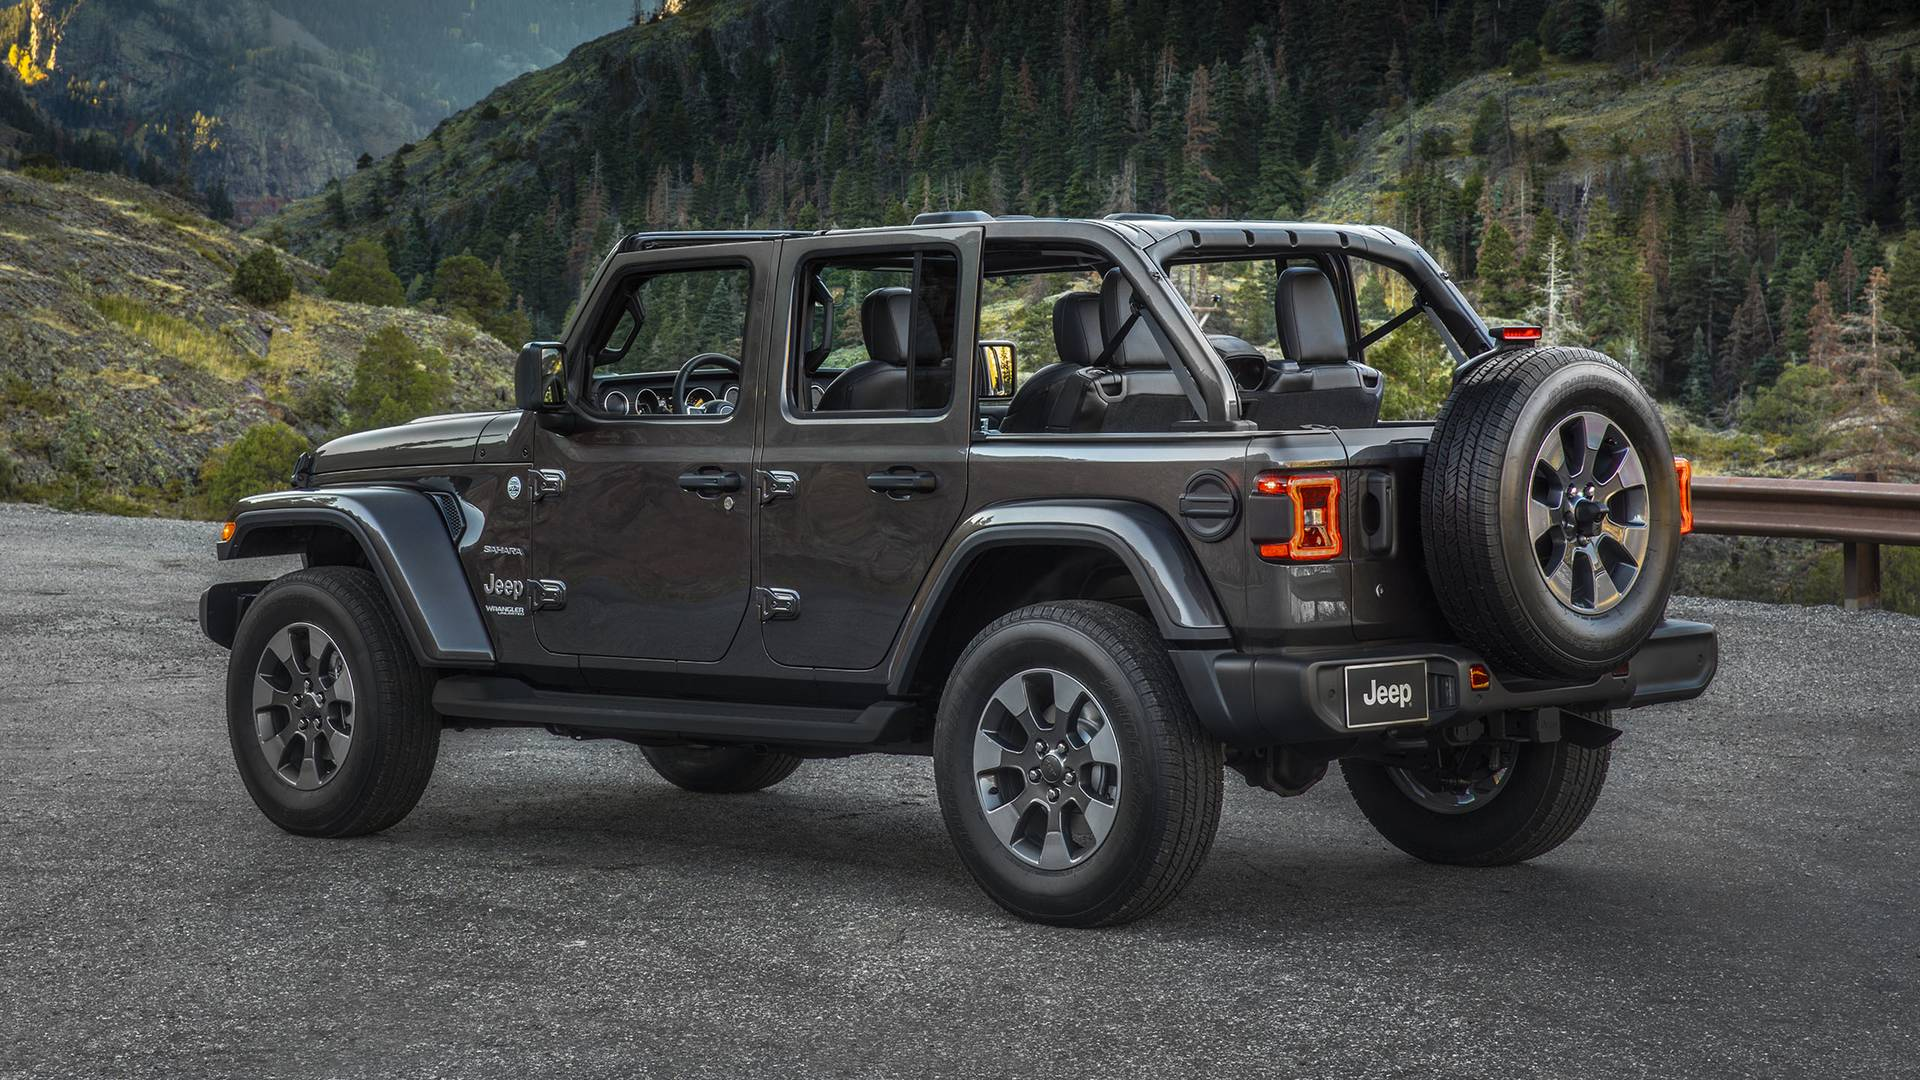 sell wrangler peddle for philadelphia jeep tj pa sale pennsylvania in